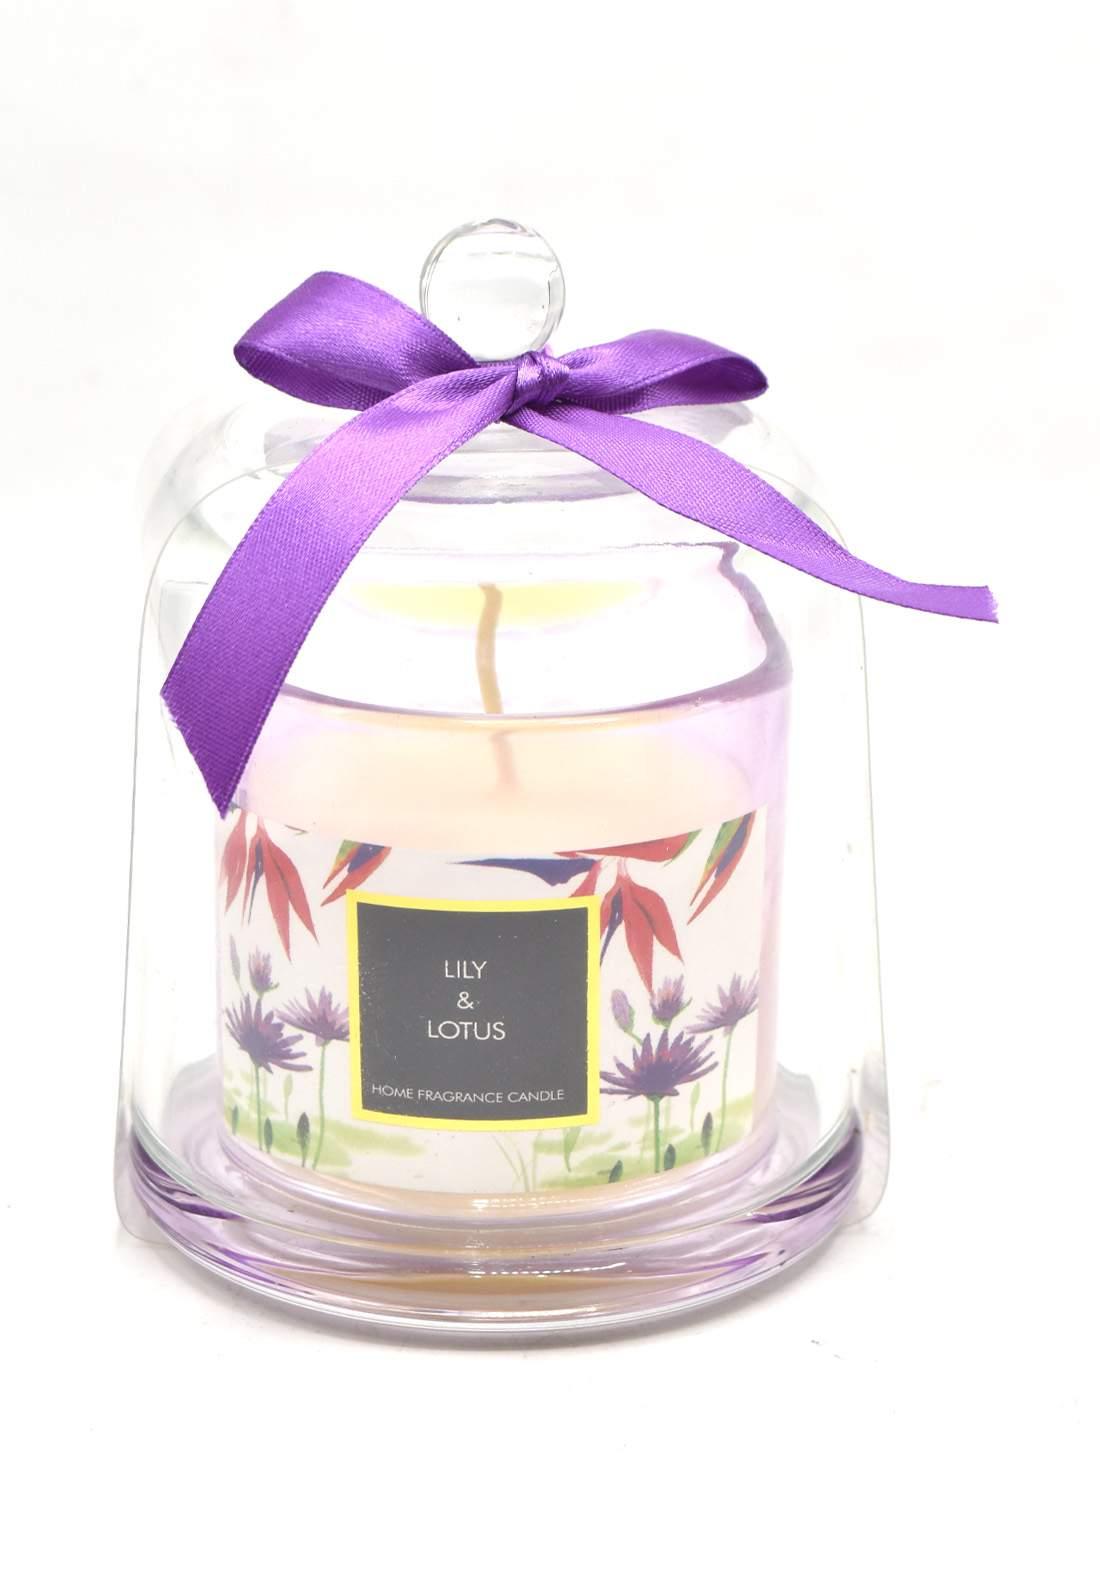 Home Fragrance Candle Lily and Lotus شمعة عطرية عطر زهرة اللوتس